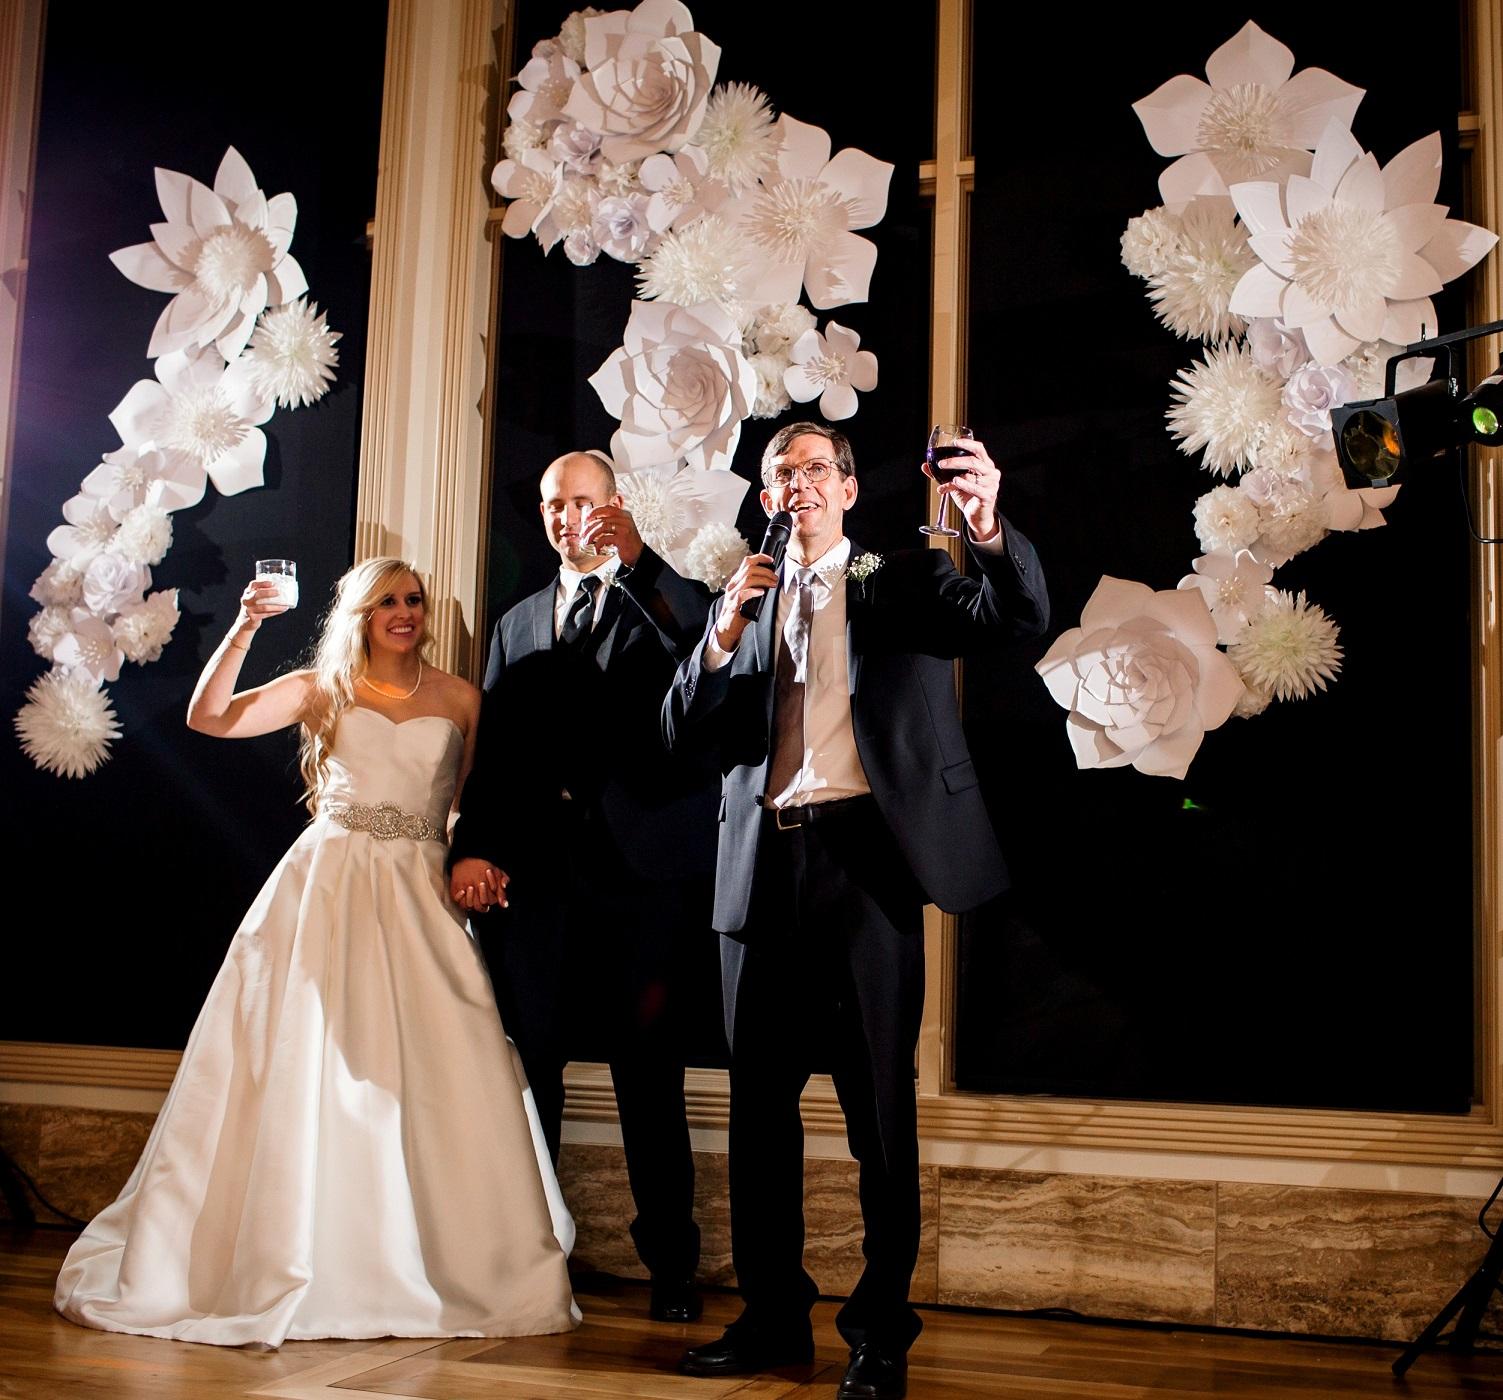 Wedding Decorations Large White Paper flowers.jpg